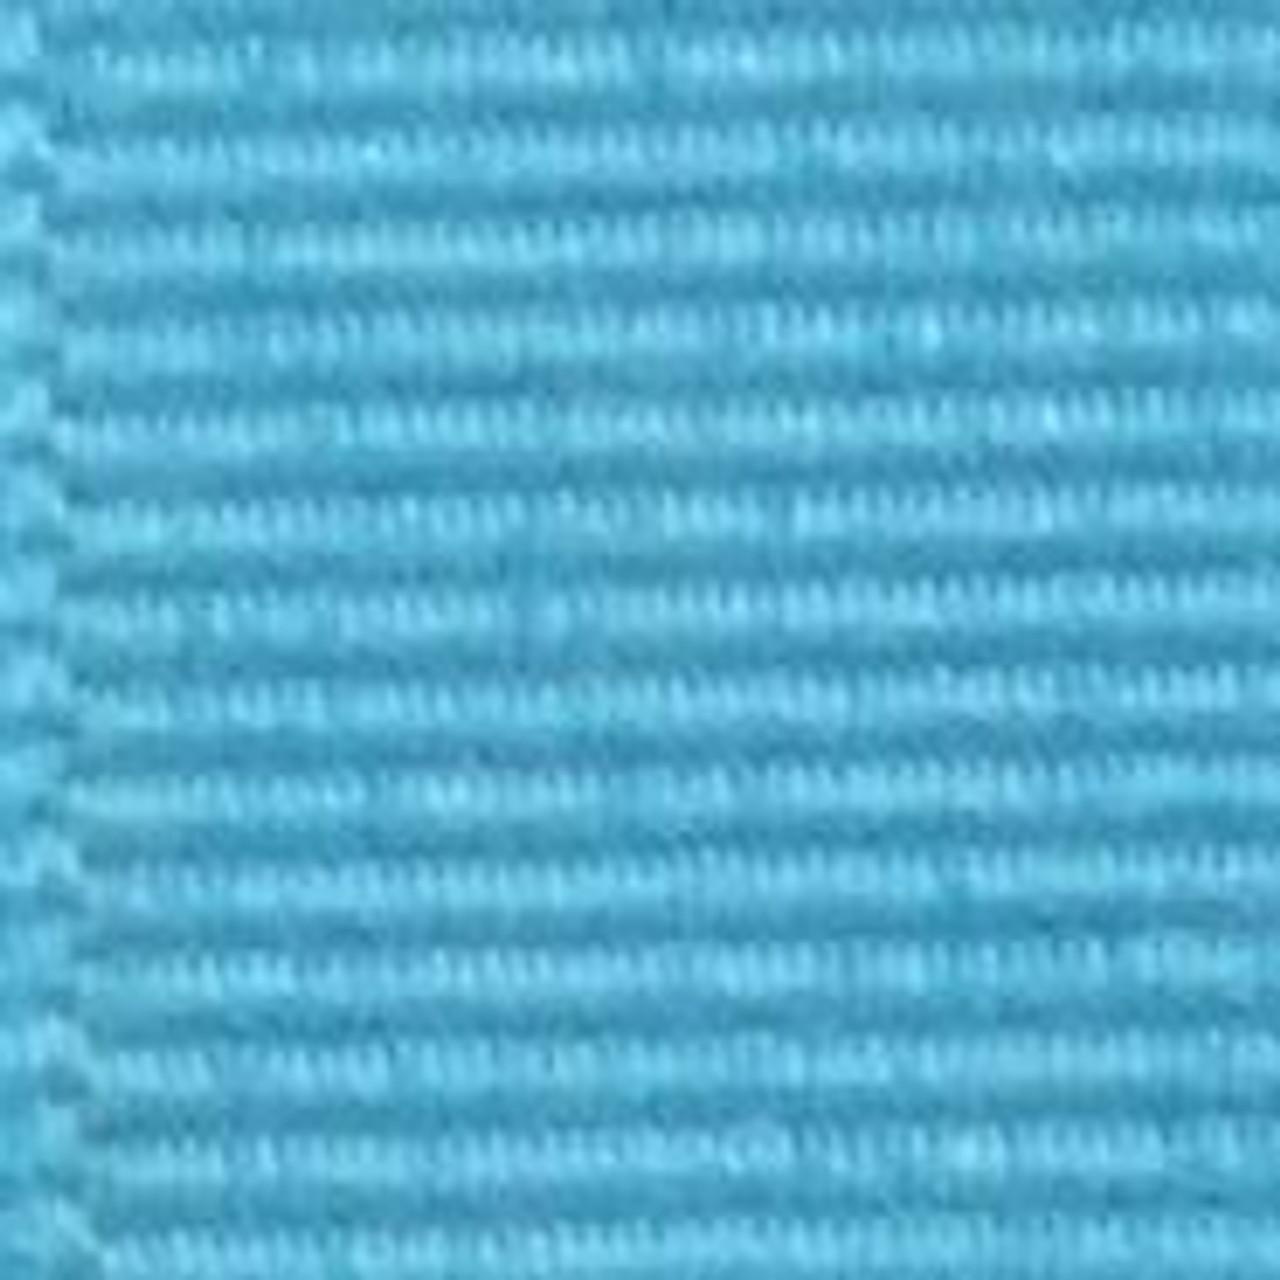 Mystic Blue Offray Grosgrain Ribbon